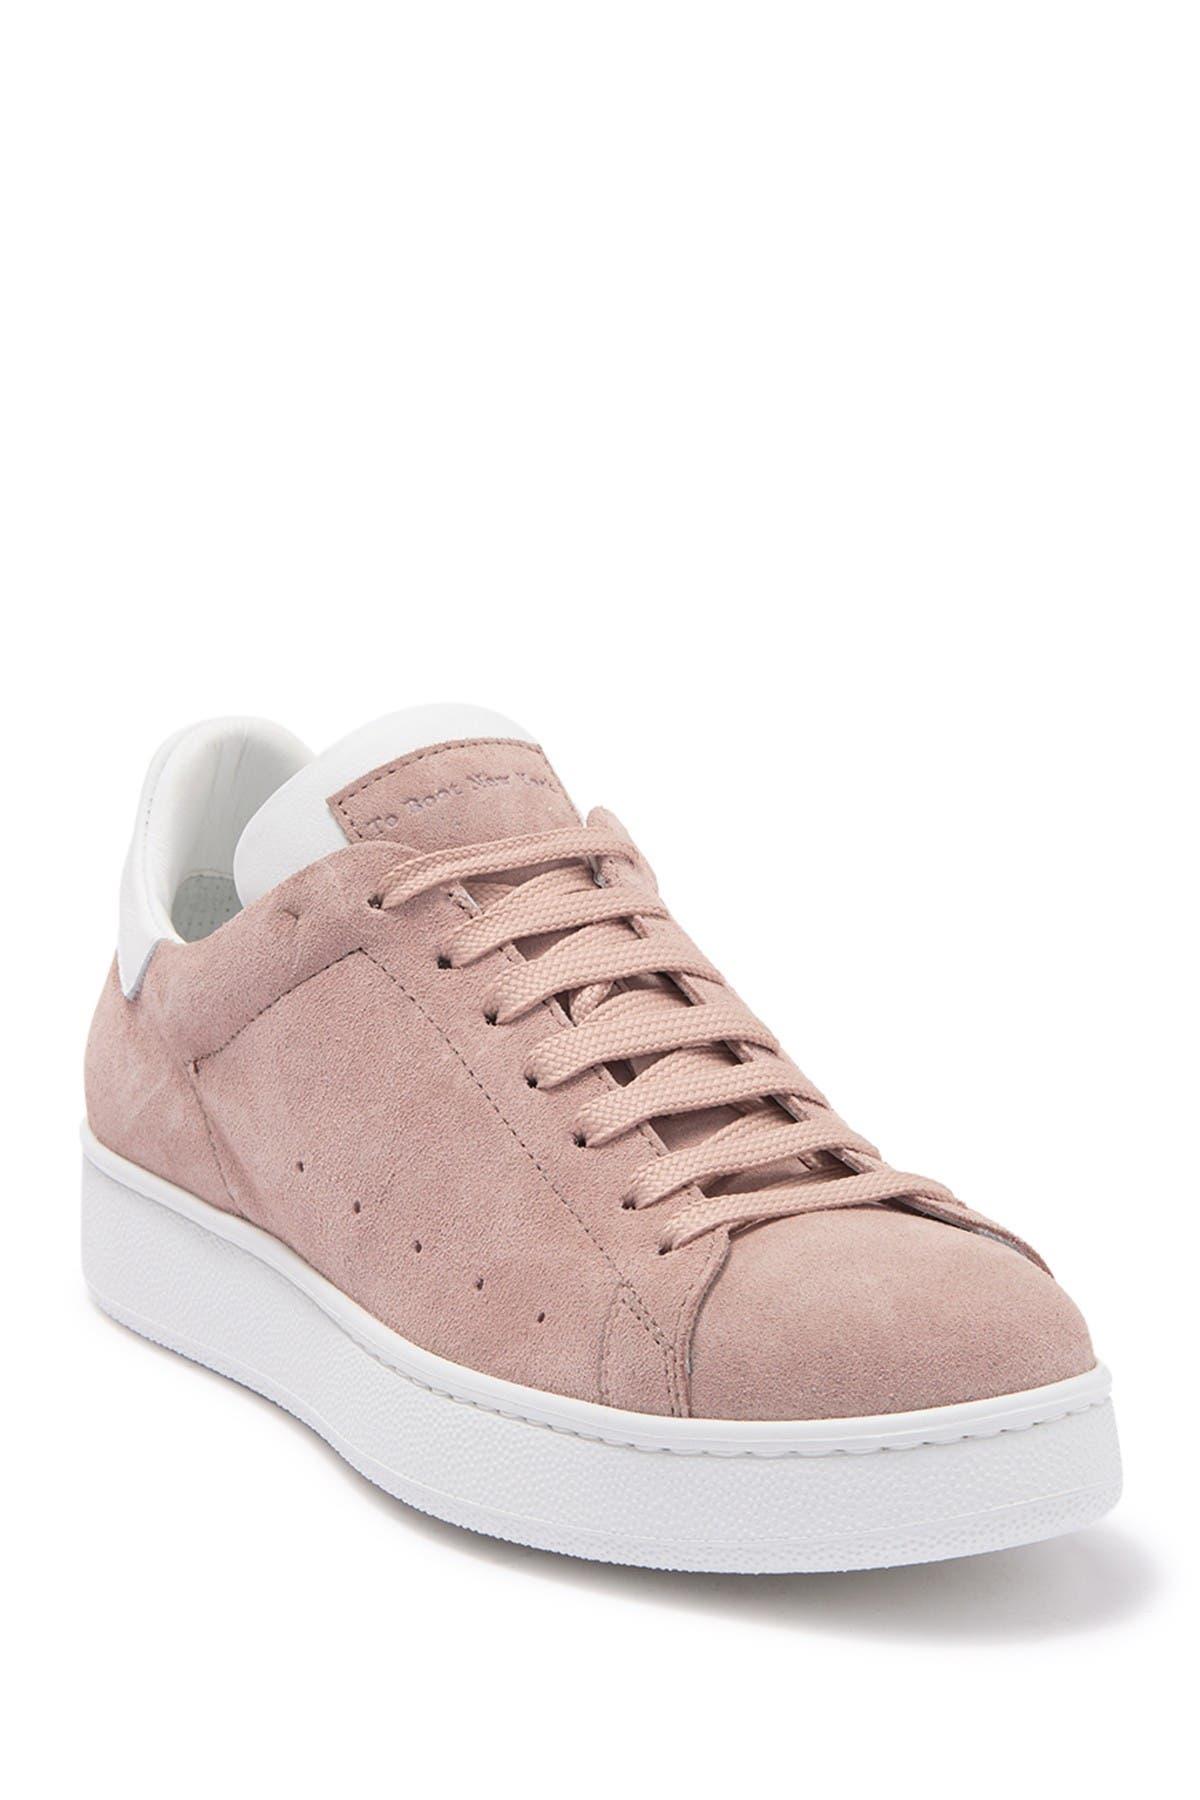 Image of To Boot New York Aurora Platform Sneaker